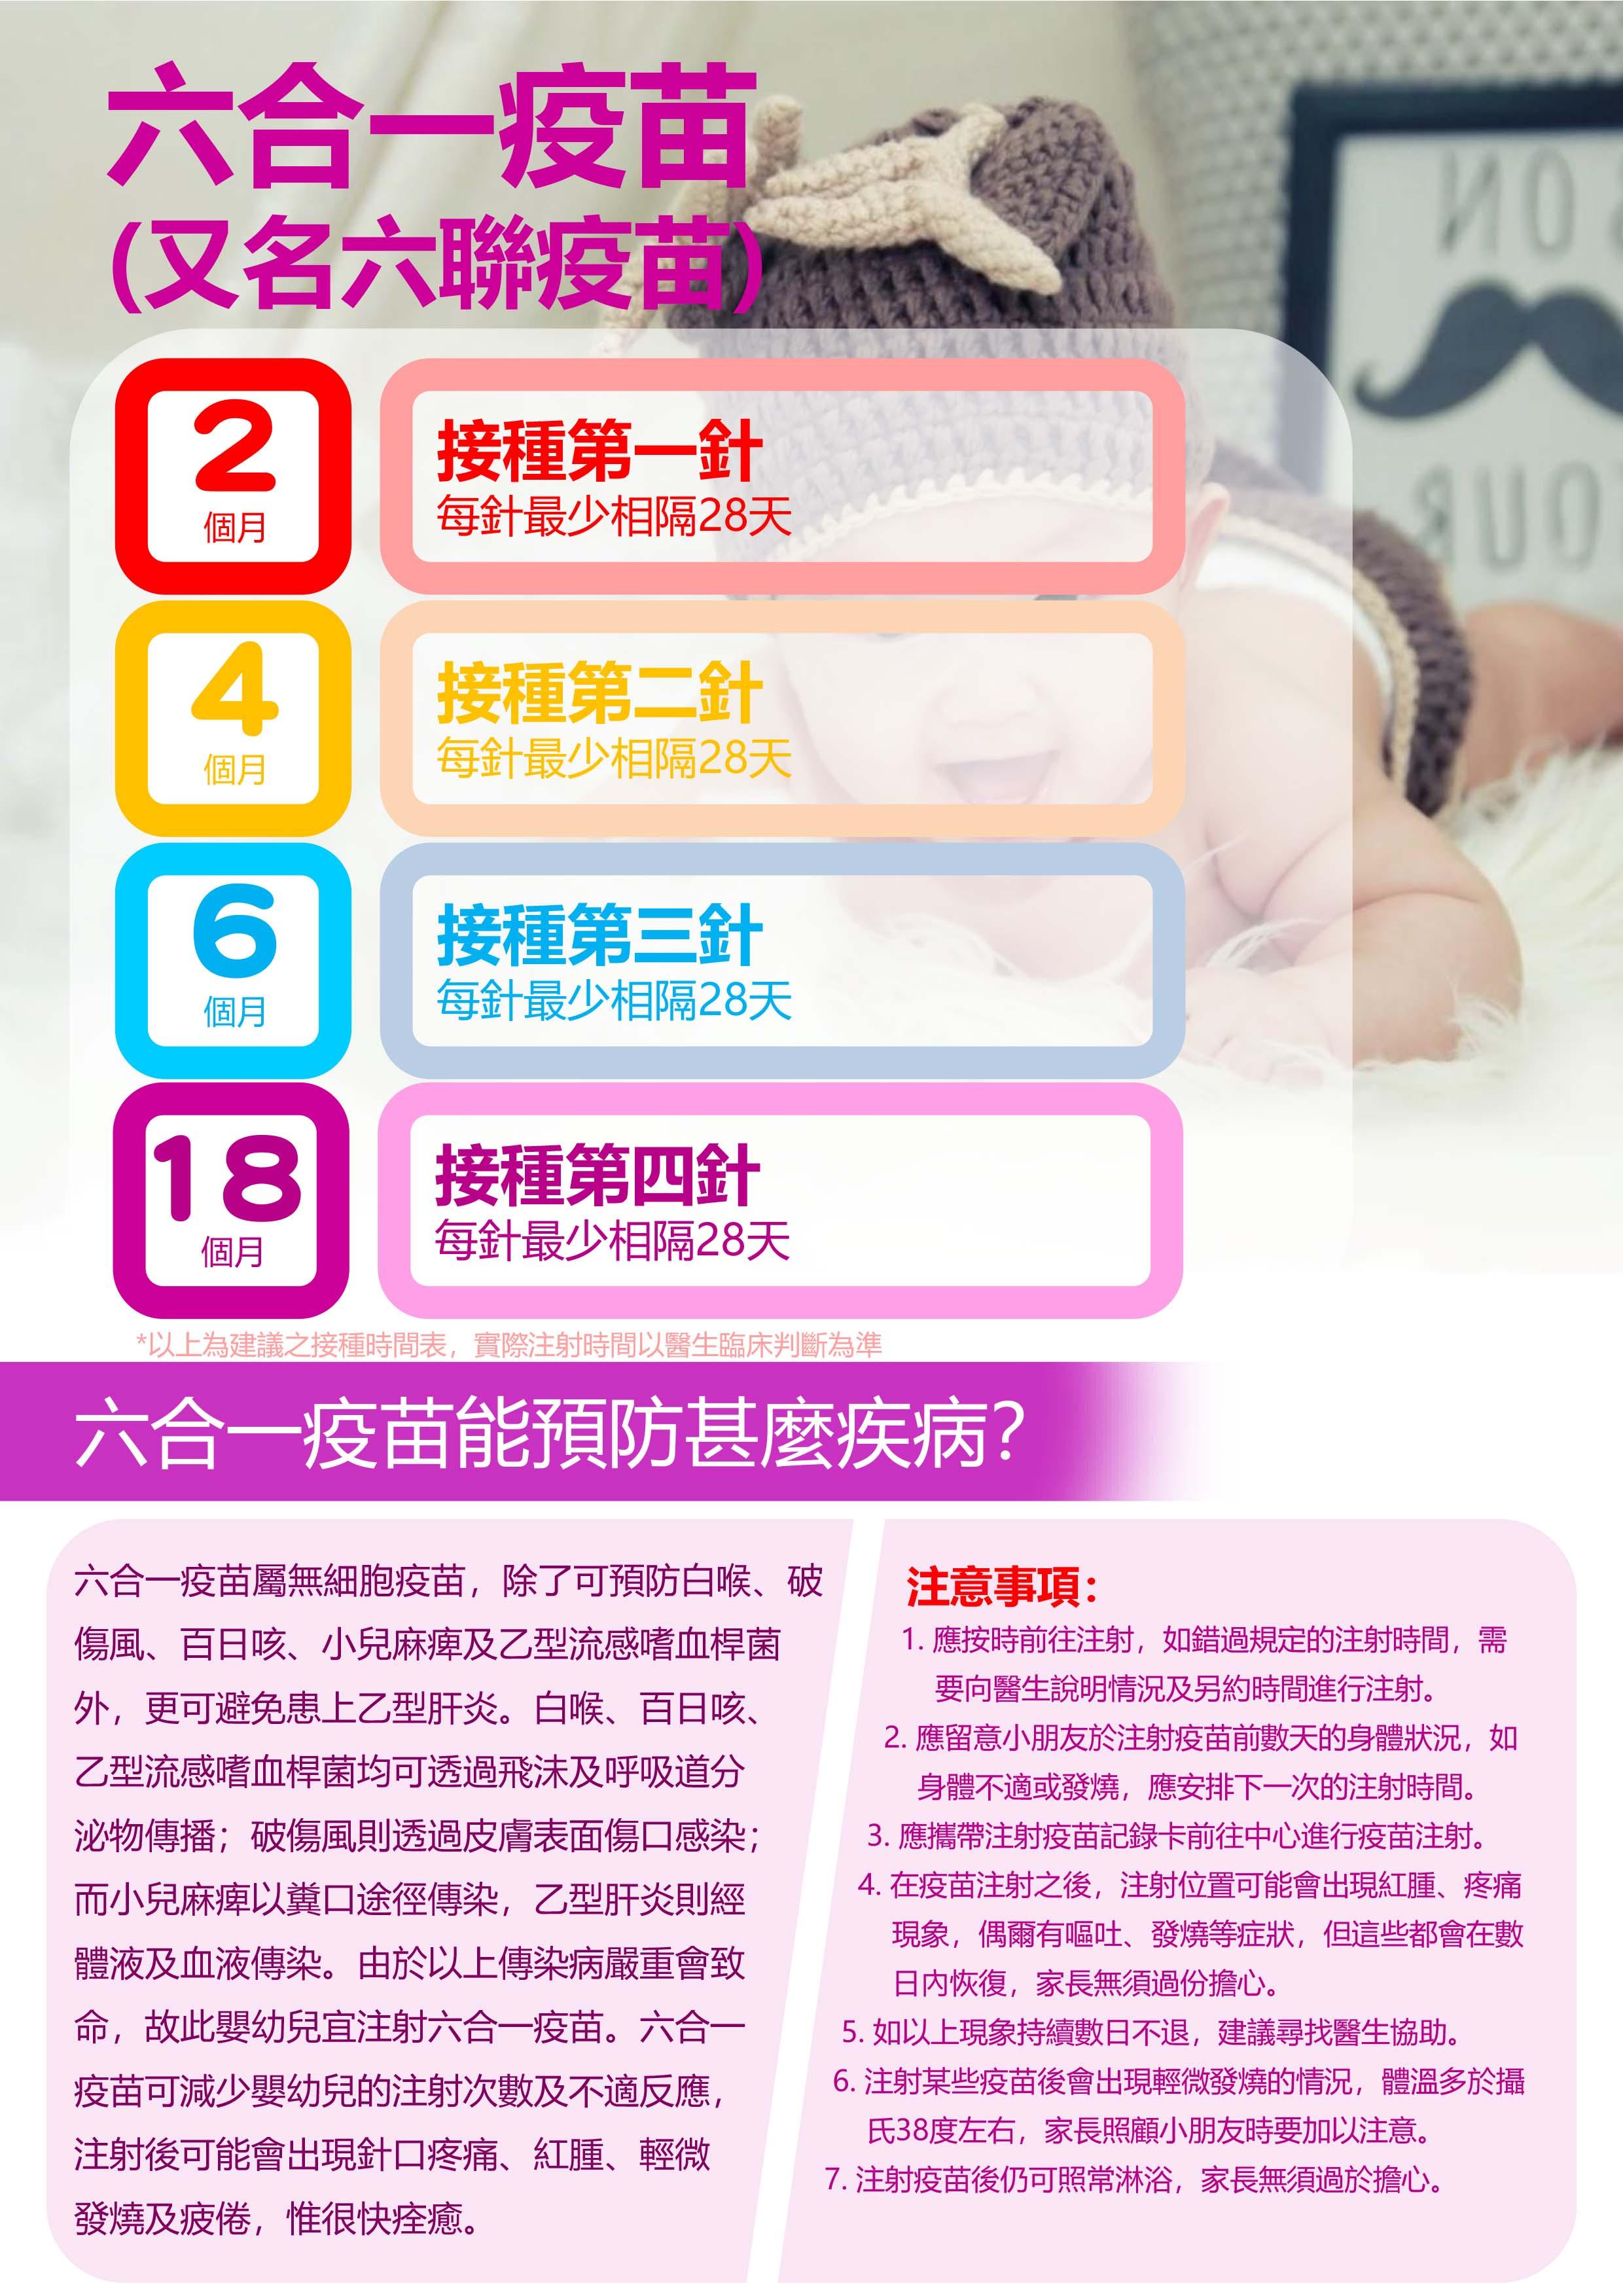 3h-baby-6-in-1-vaccine-2.jpg